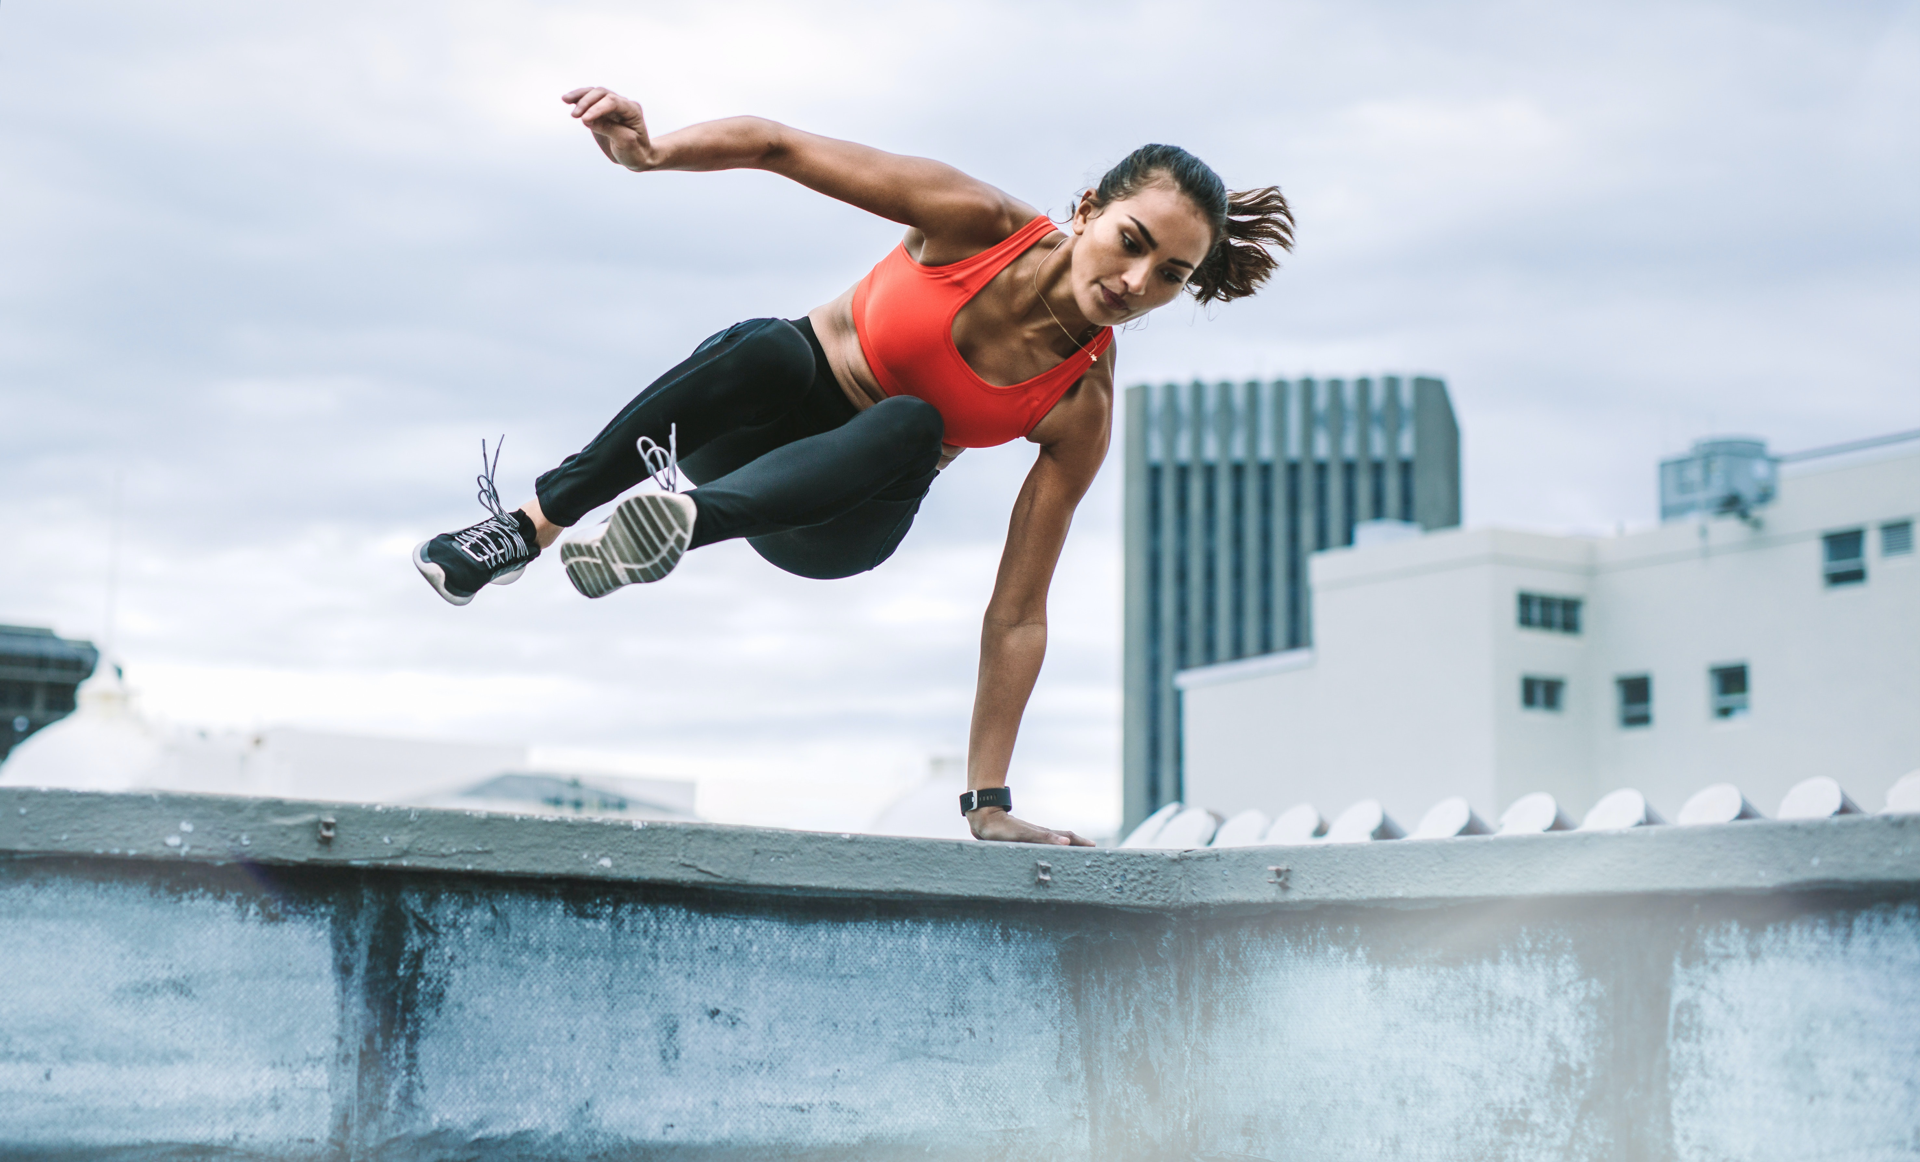 Ban leggings on campus? Ludicrous -- wearing leggings allows women to move like superheroes